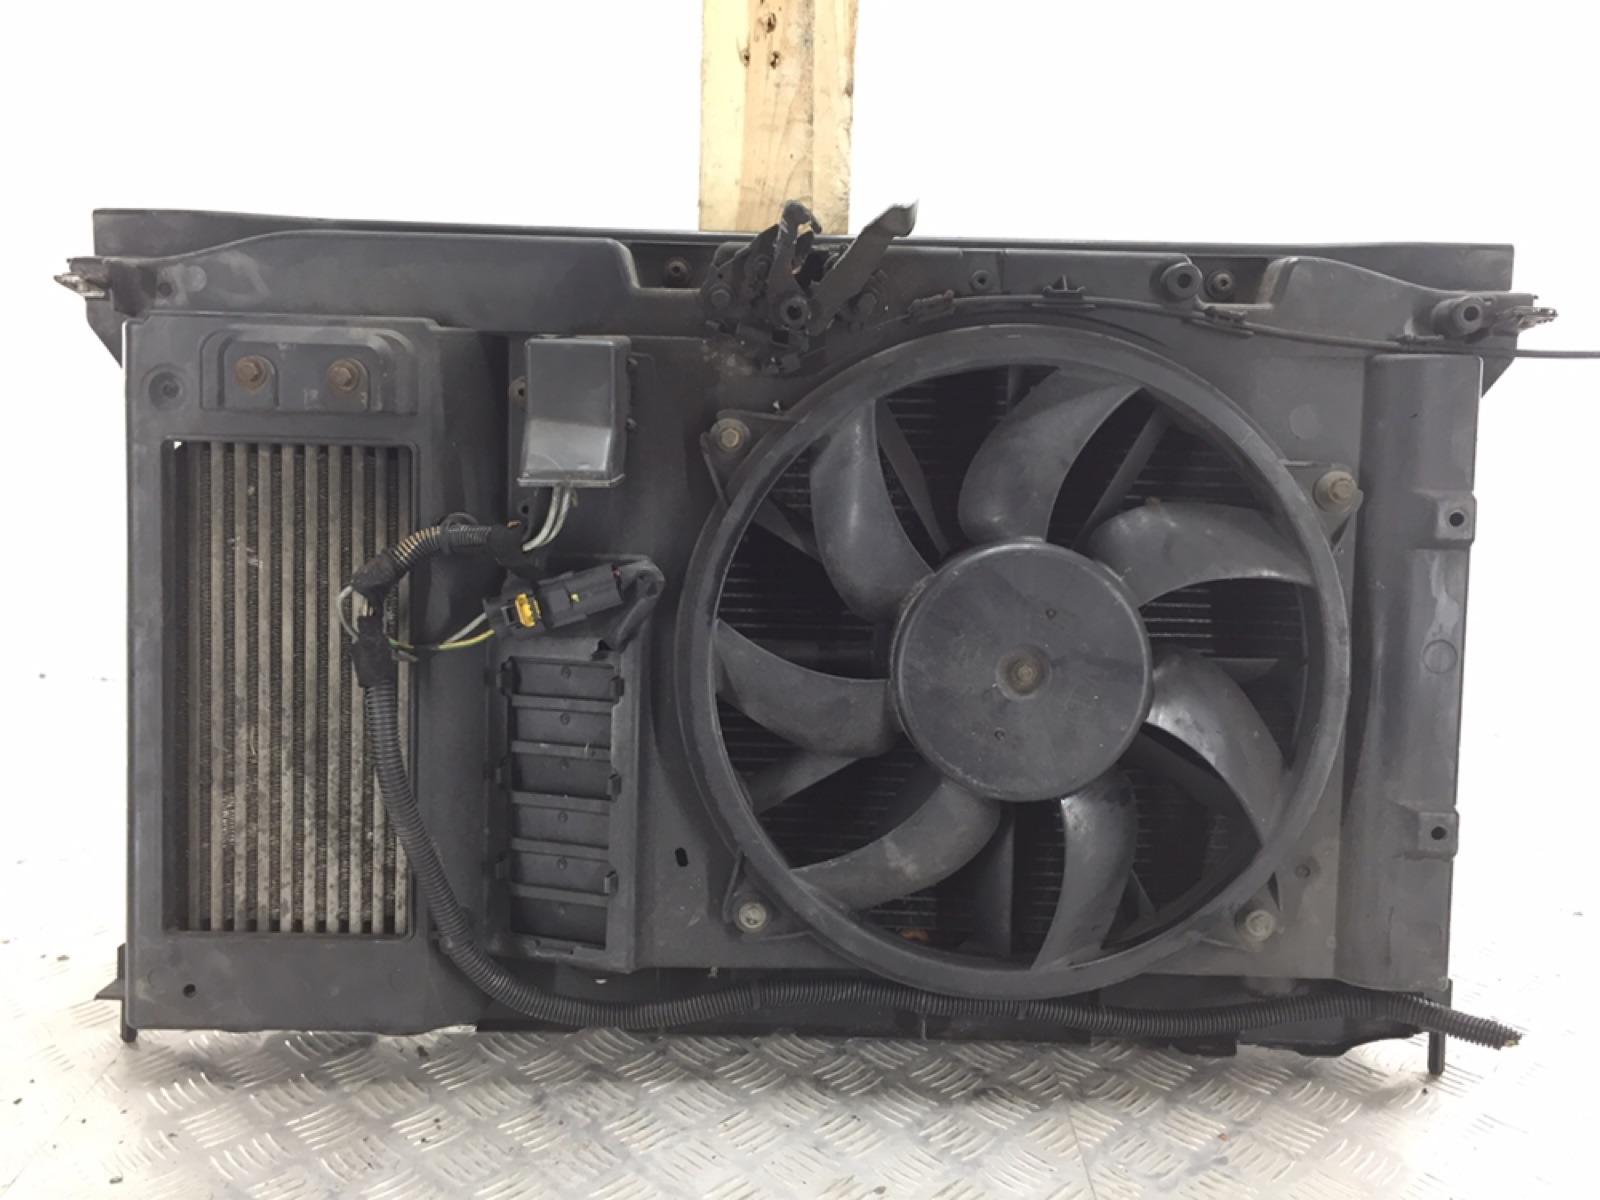 Кассета радиаторов Peugeot 307 1.6 HDI 2005 (б/у)